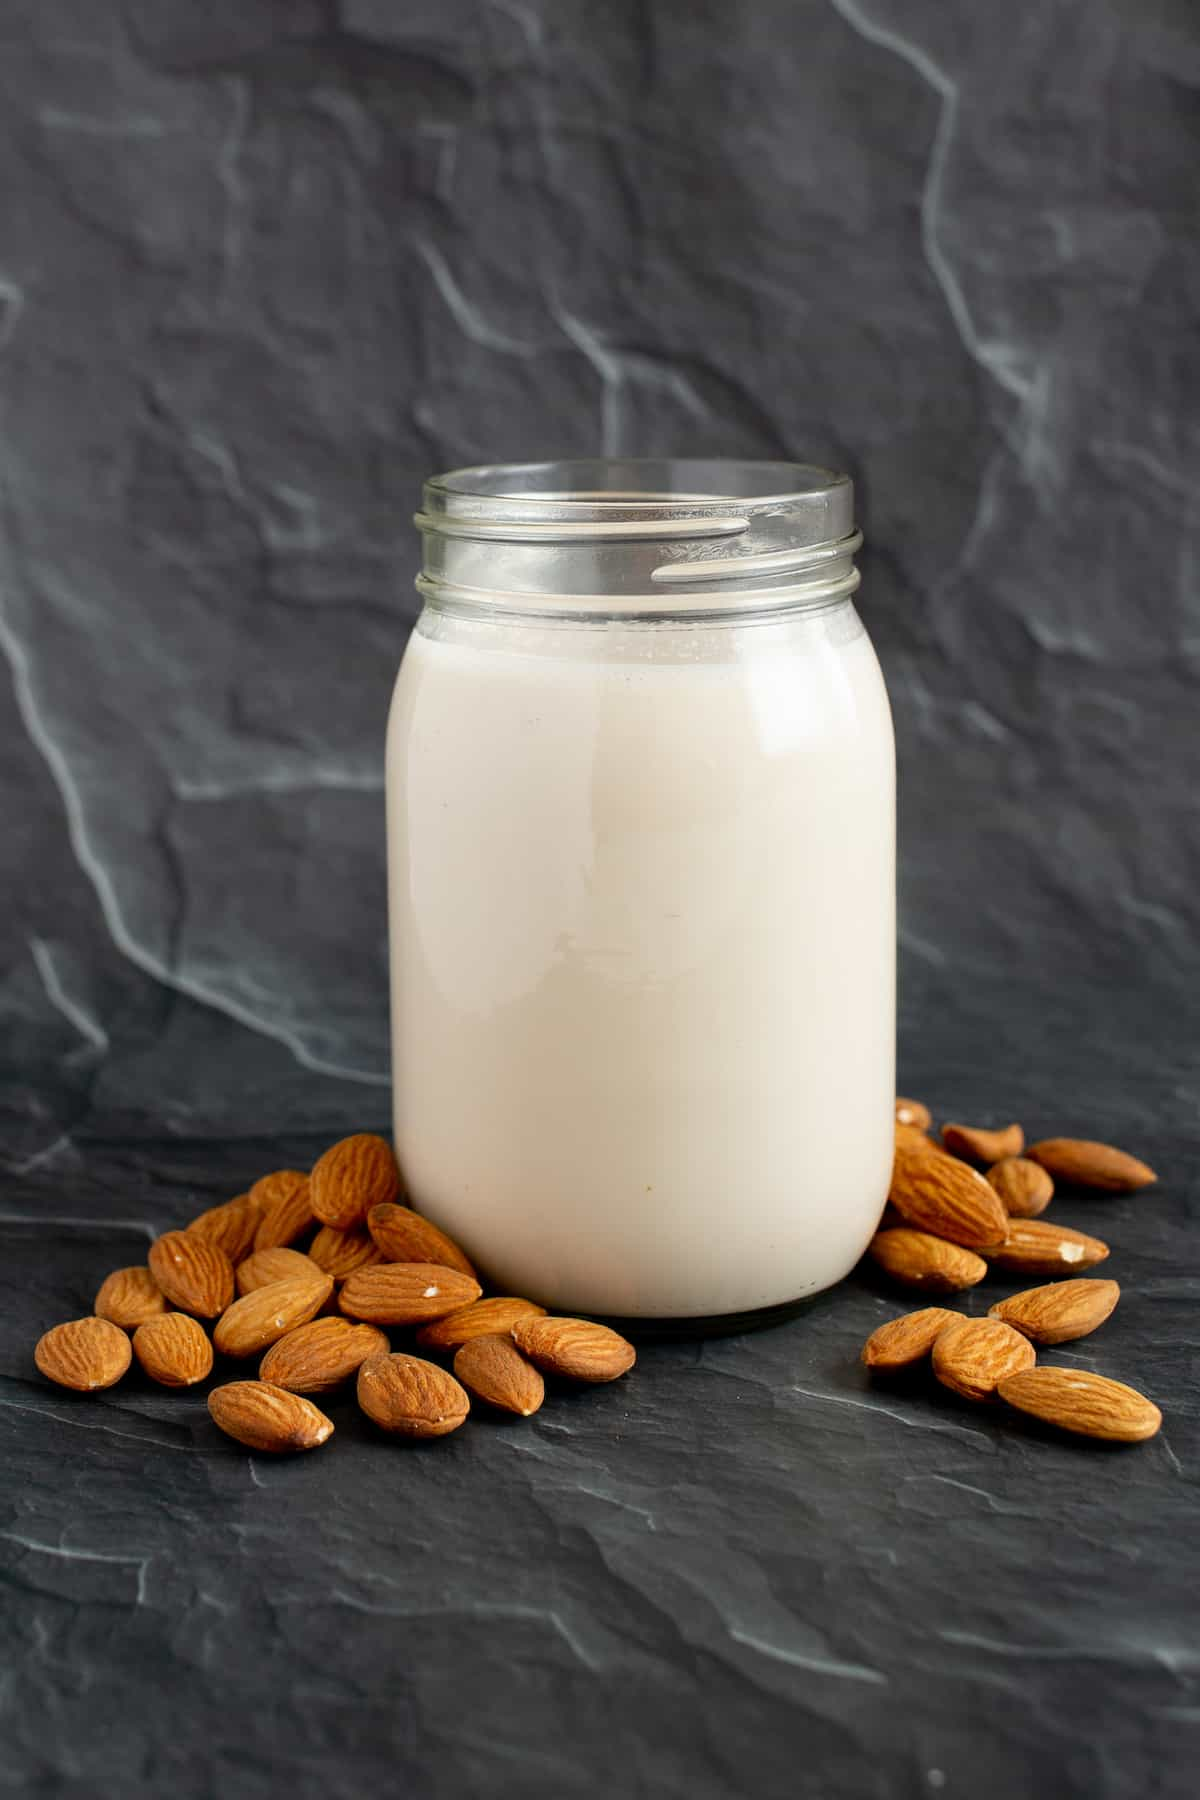 How to Make Almond Milk in a Slow Juicer or Blender